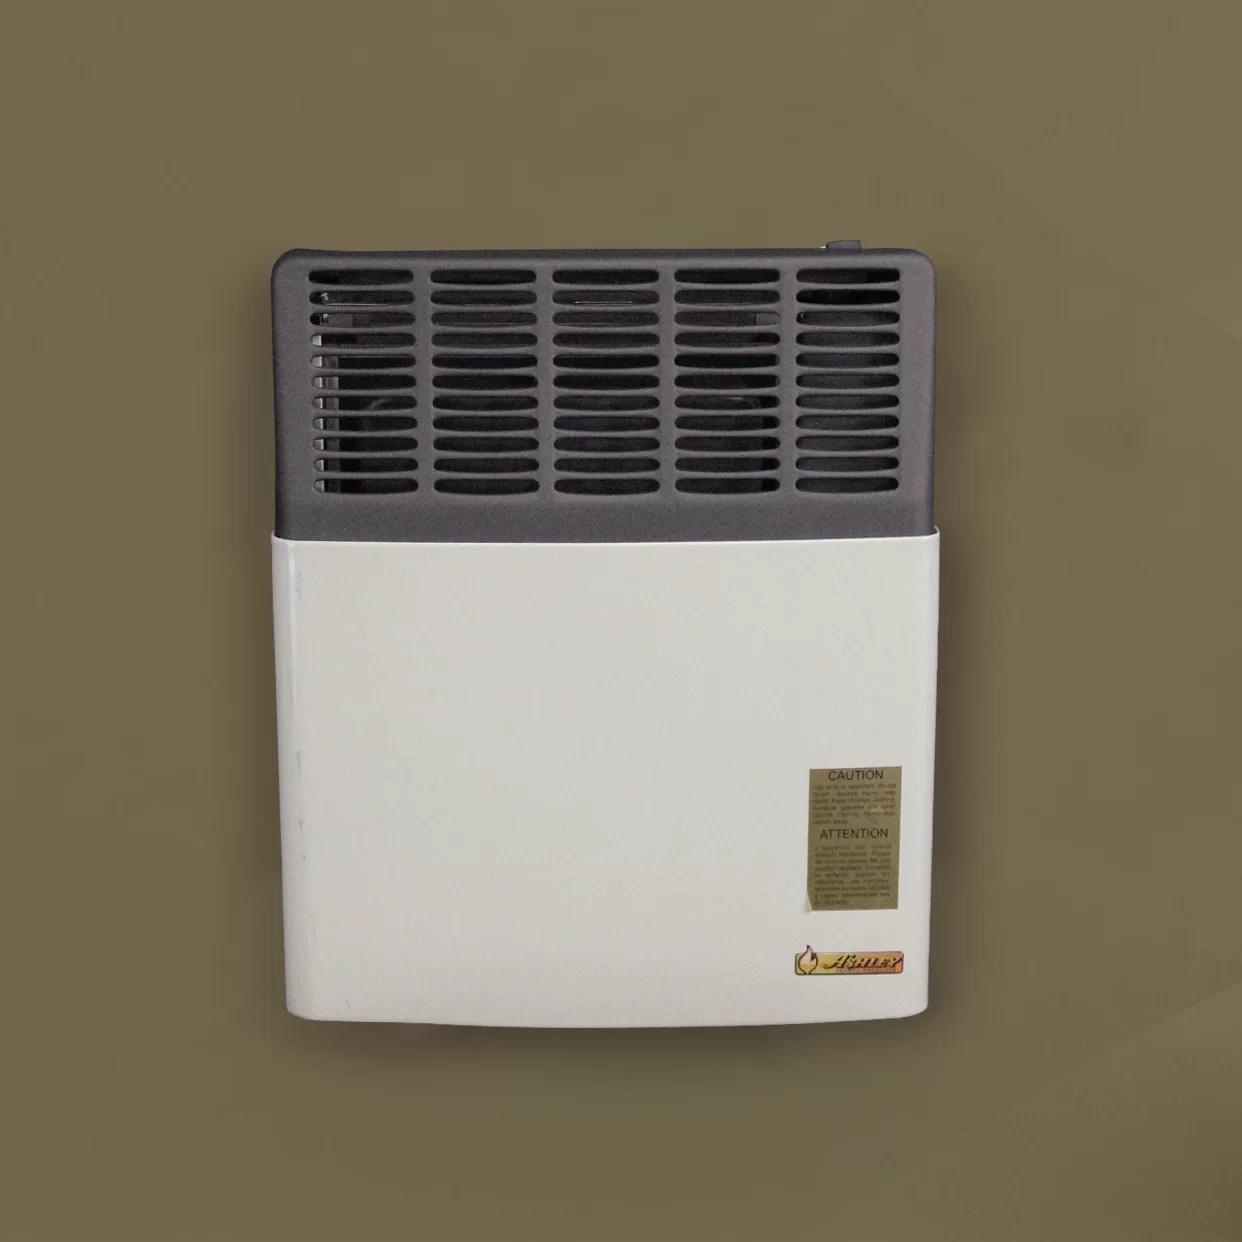 Ashley Hearth 11000 BTU Natural Gas Direct Vent Heater  Reviews  Wayfair